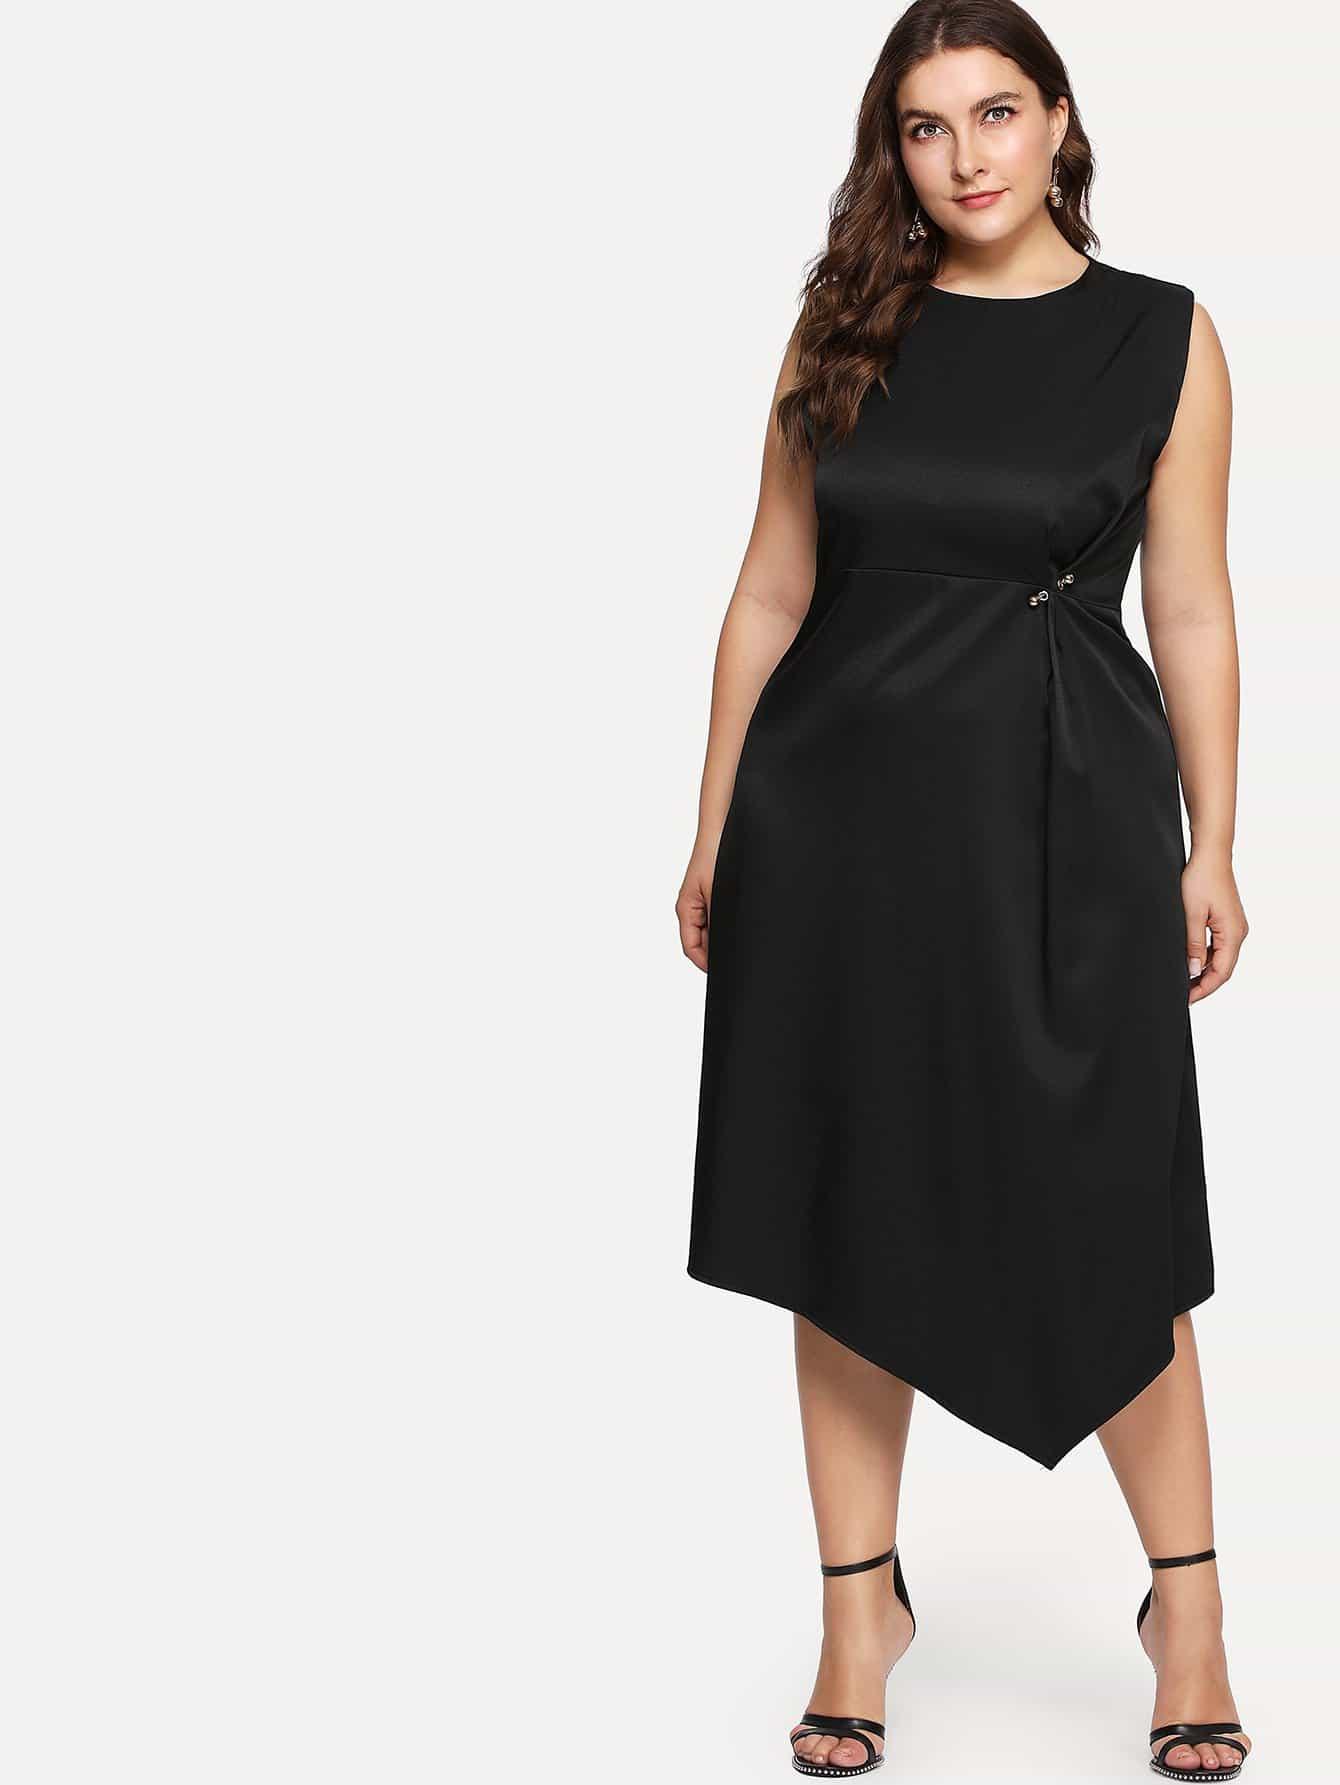 Asymmetrical Hem Dress asymmetrical hem color block dress